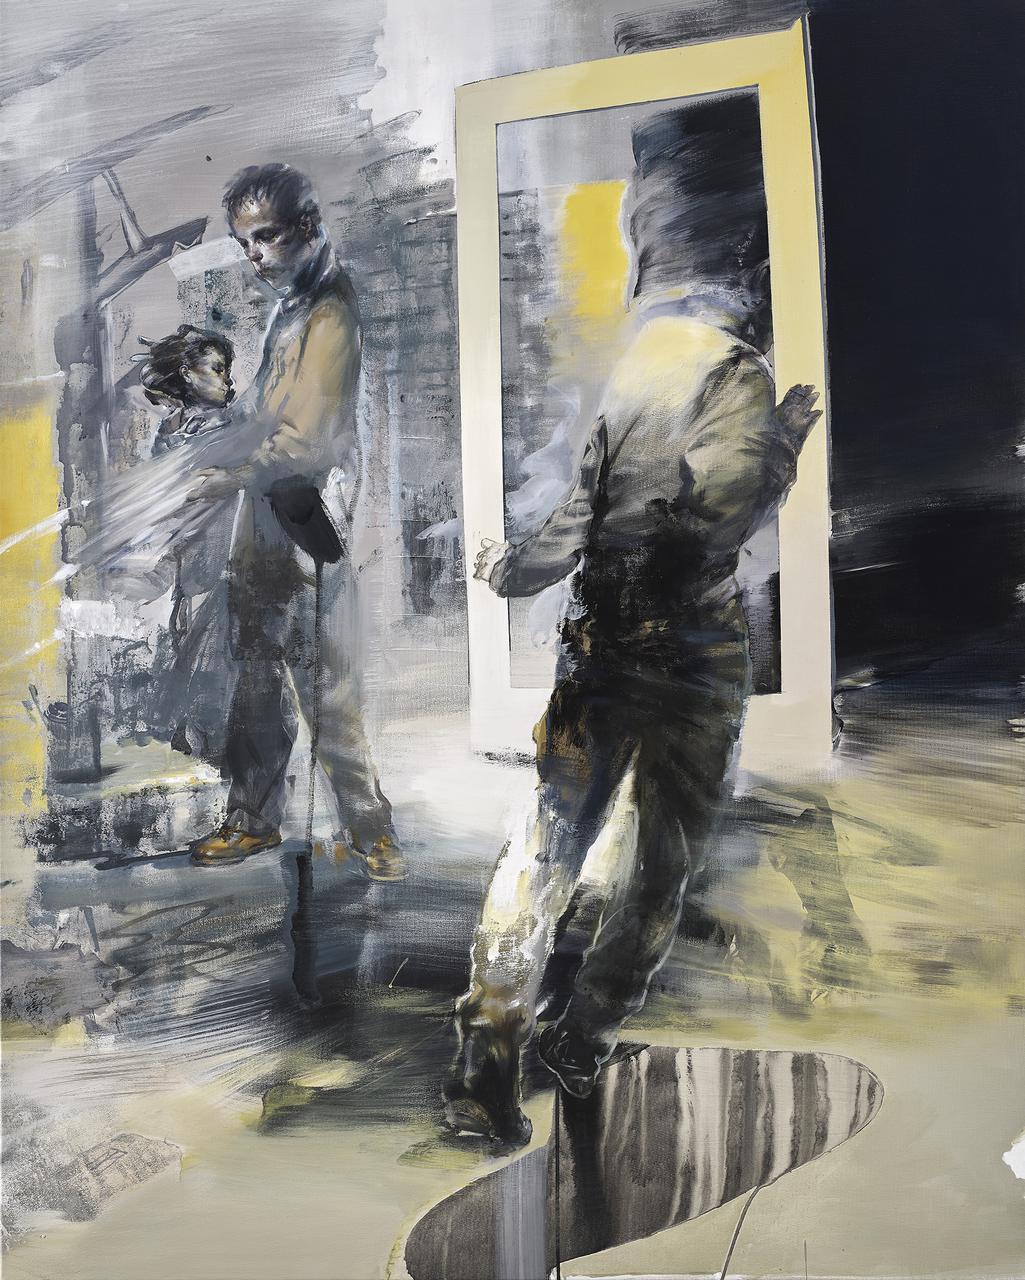 Tassos Missouras, Untitled, oil on canvas, 130 x 105 cm, 2017 Untitled, oil on canvas, 130 x 110 cm, 2017